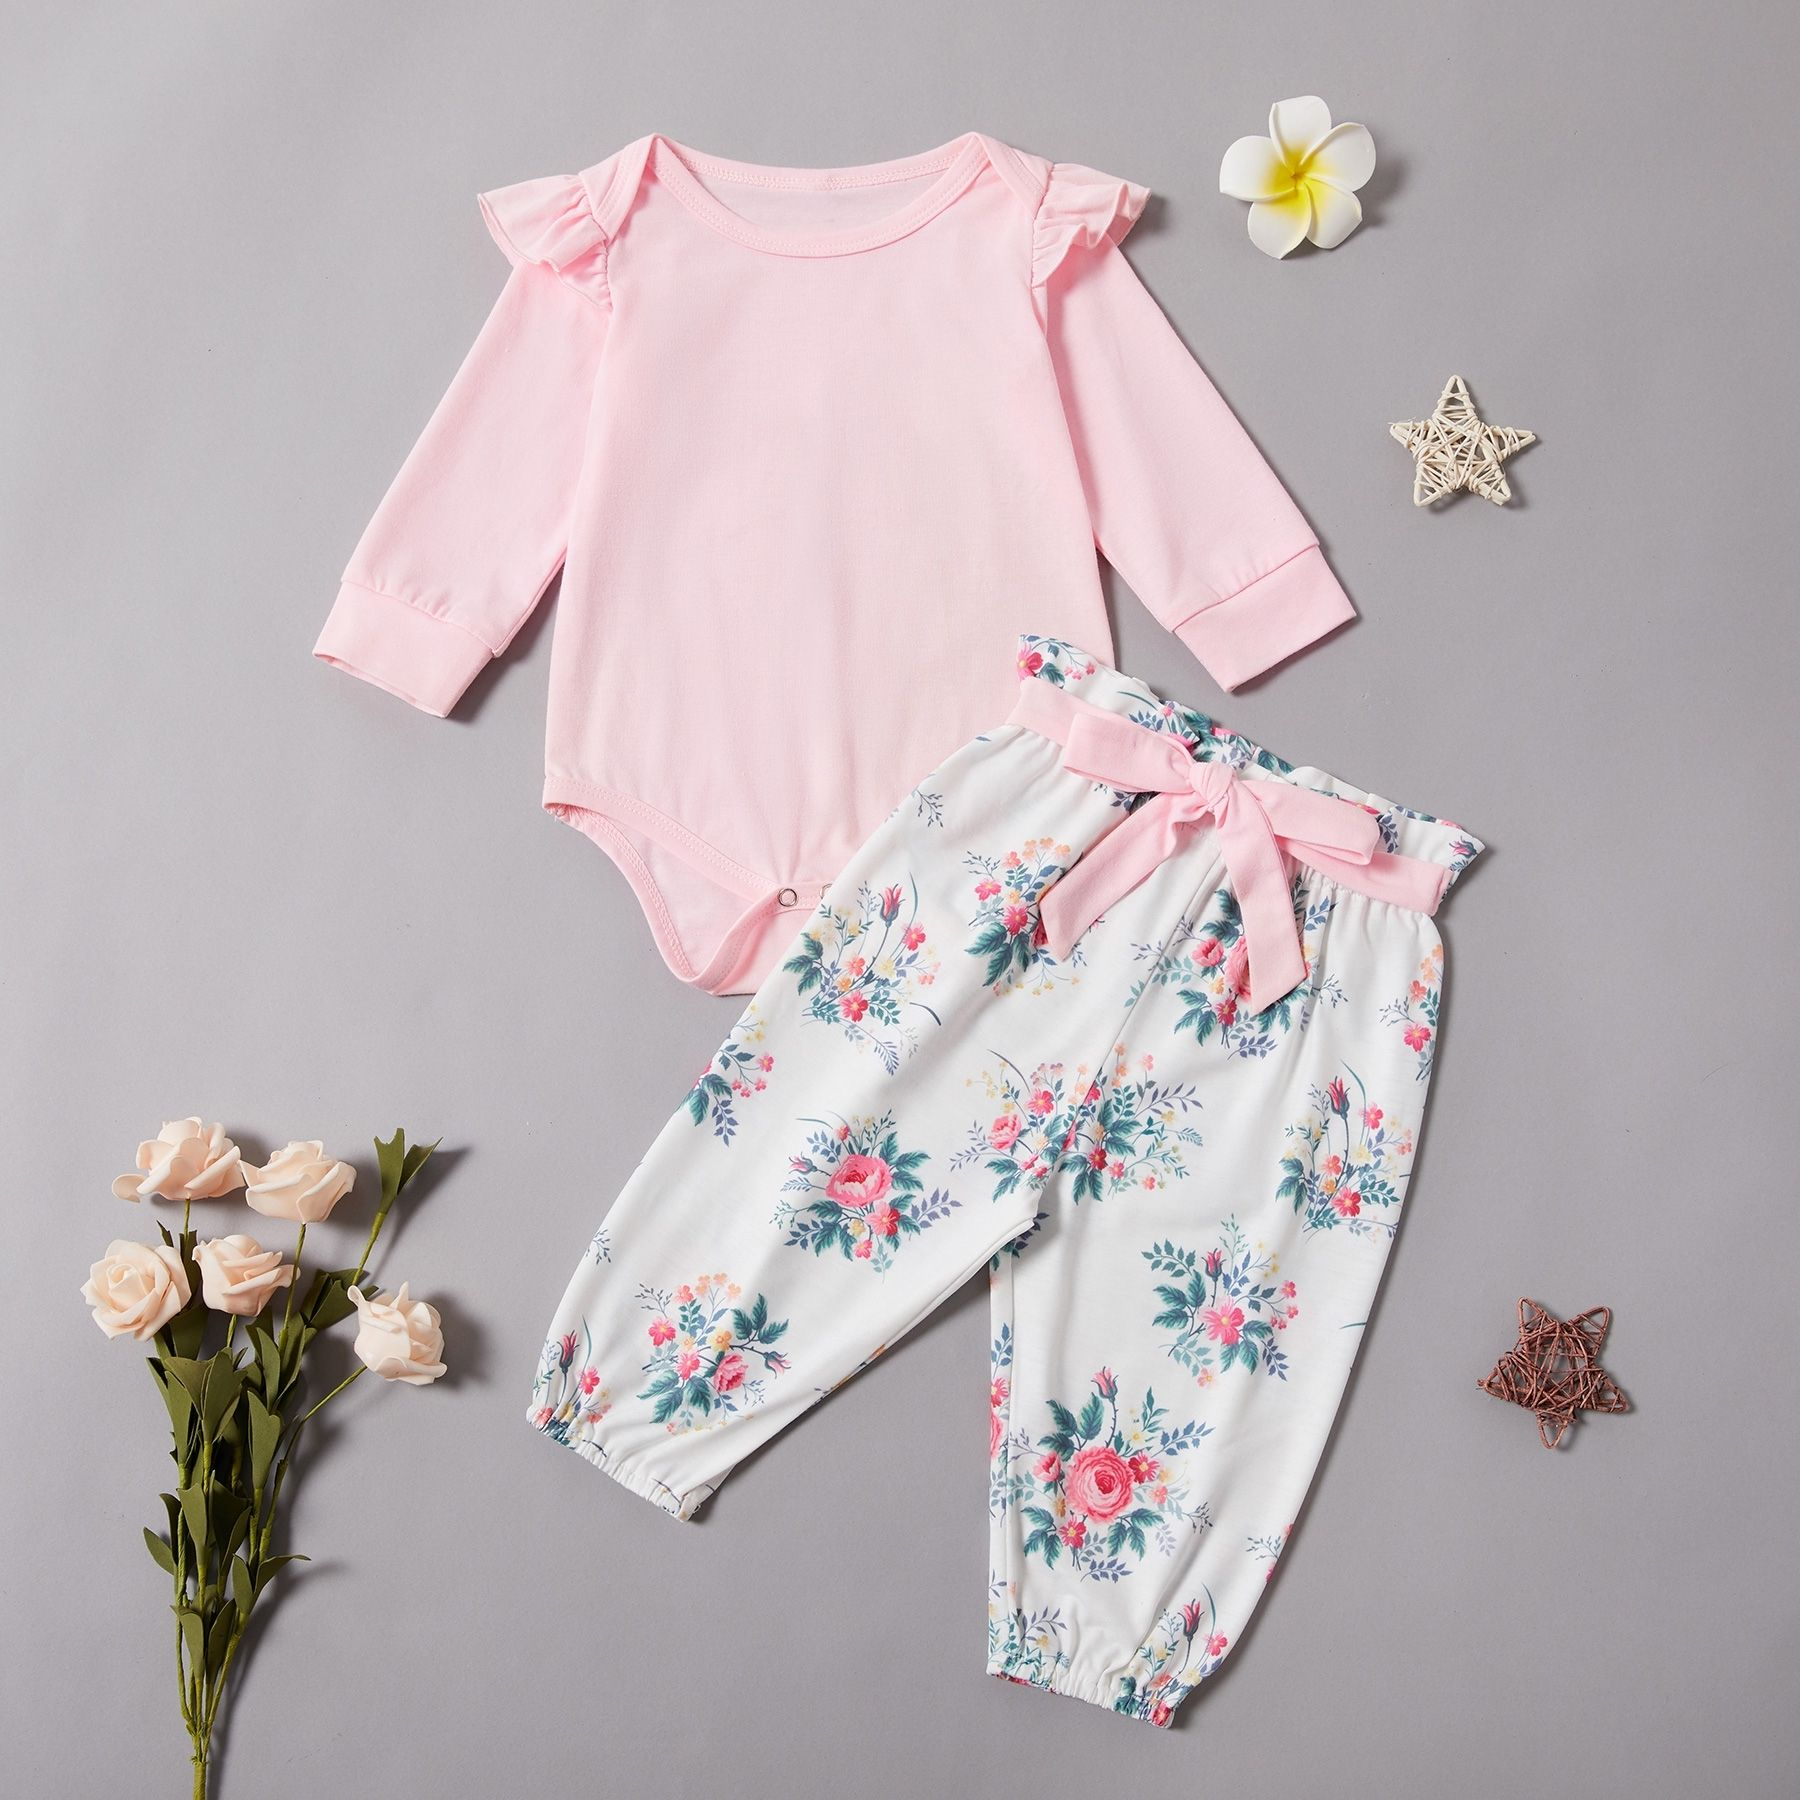 Infant Baby Girl Short Sleeve Solid T-shirt+Floral Print Long Pants+Headband Set